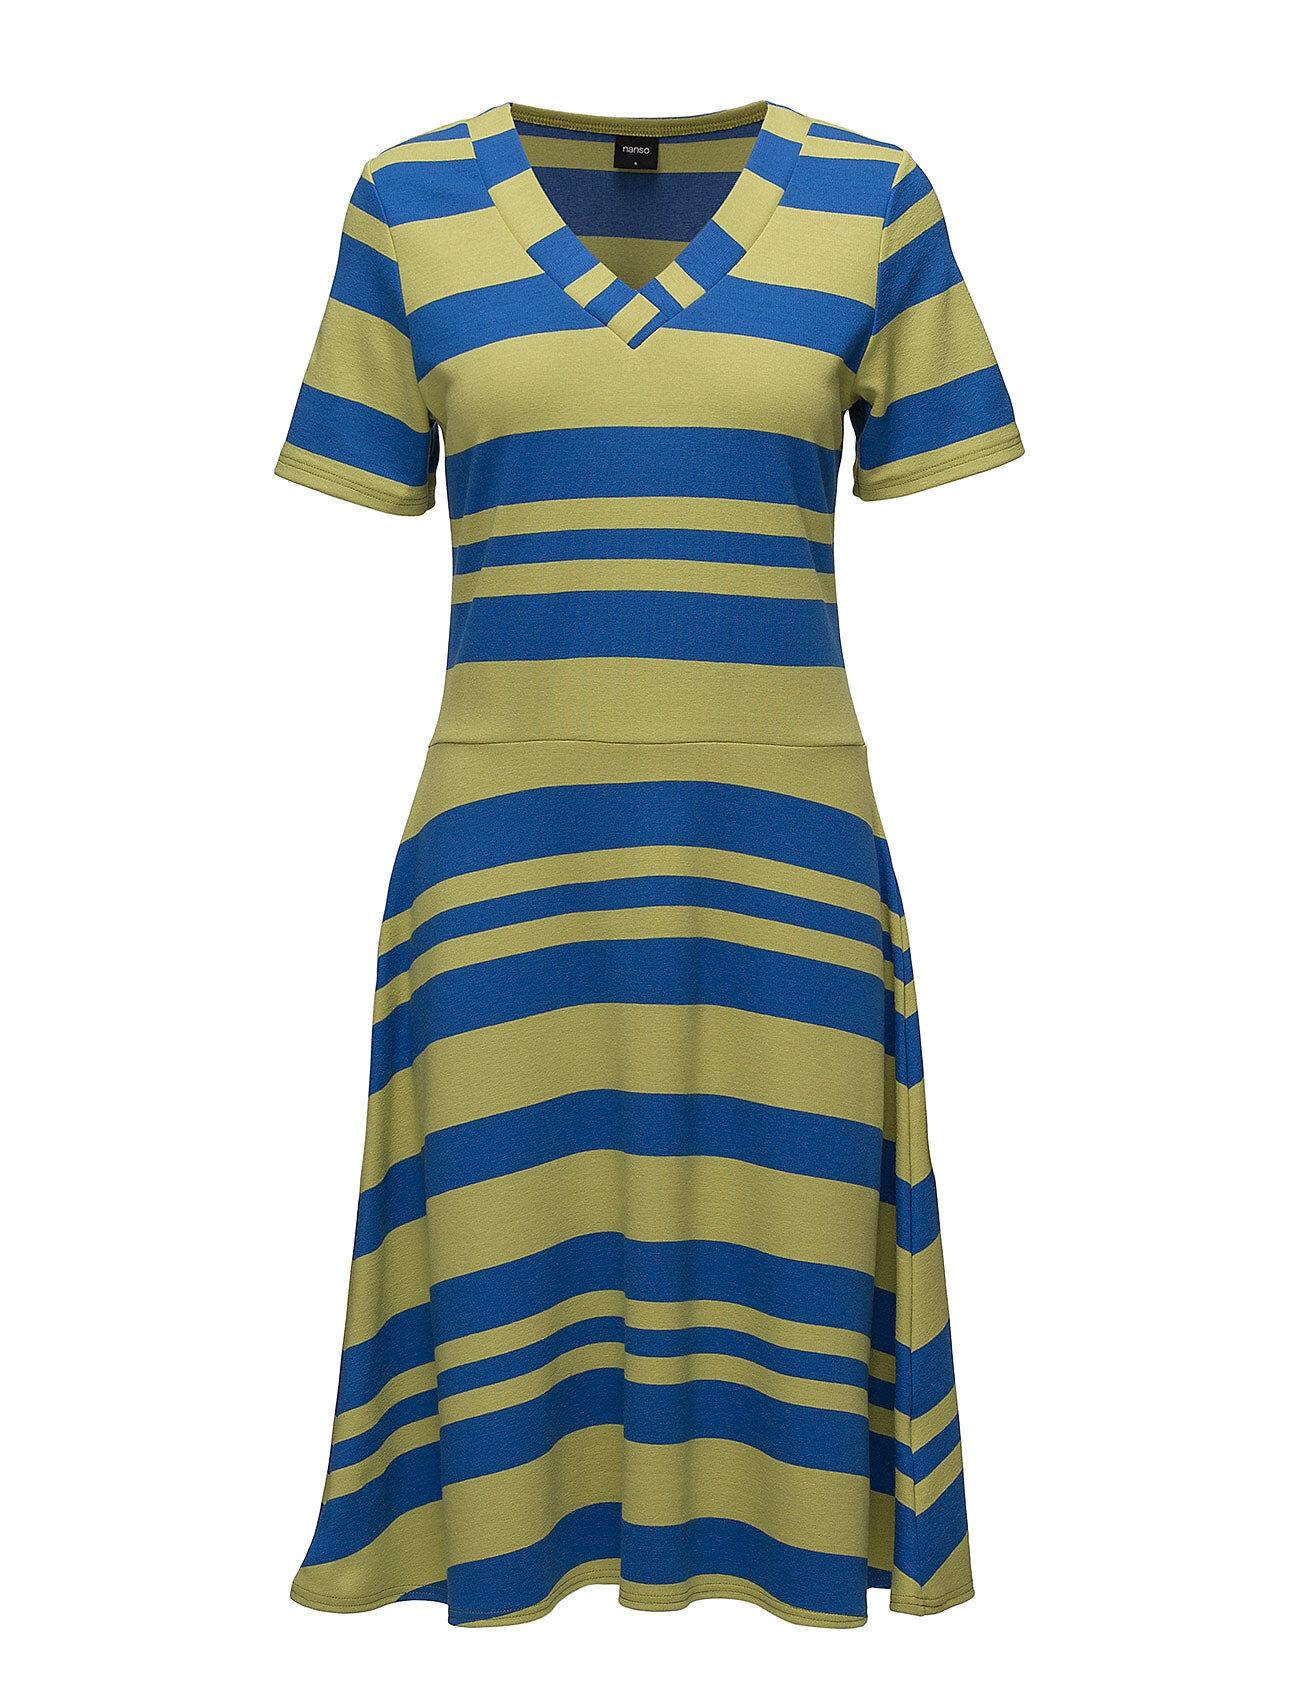 Nanso Ladies Dress, Palkki